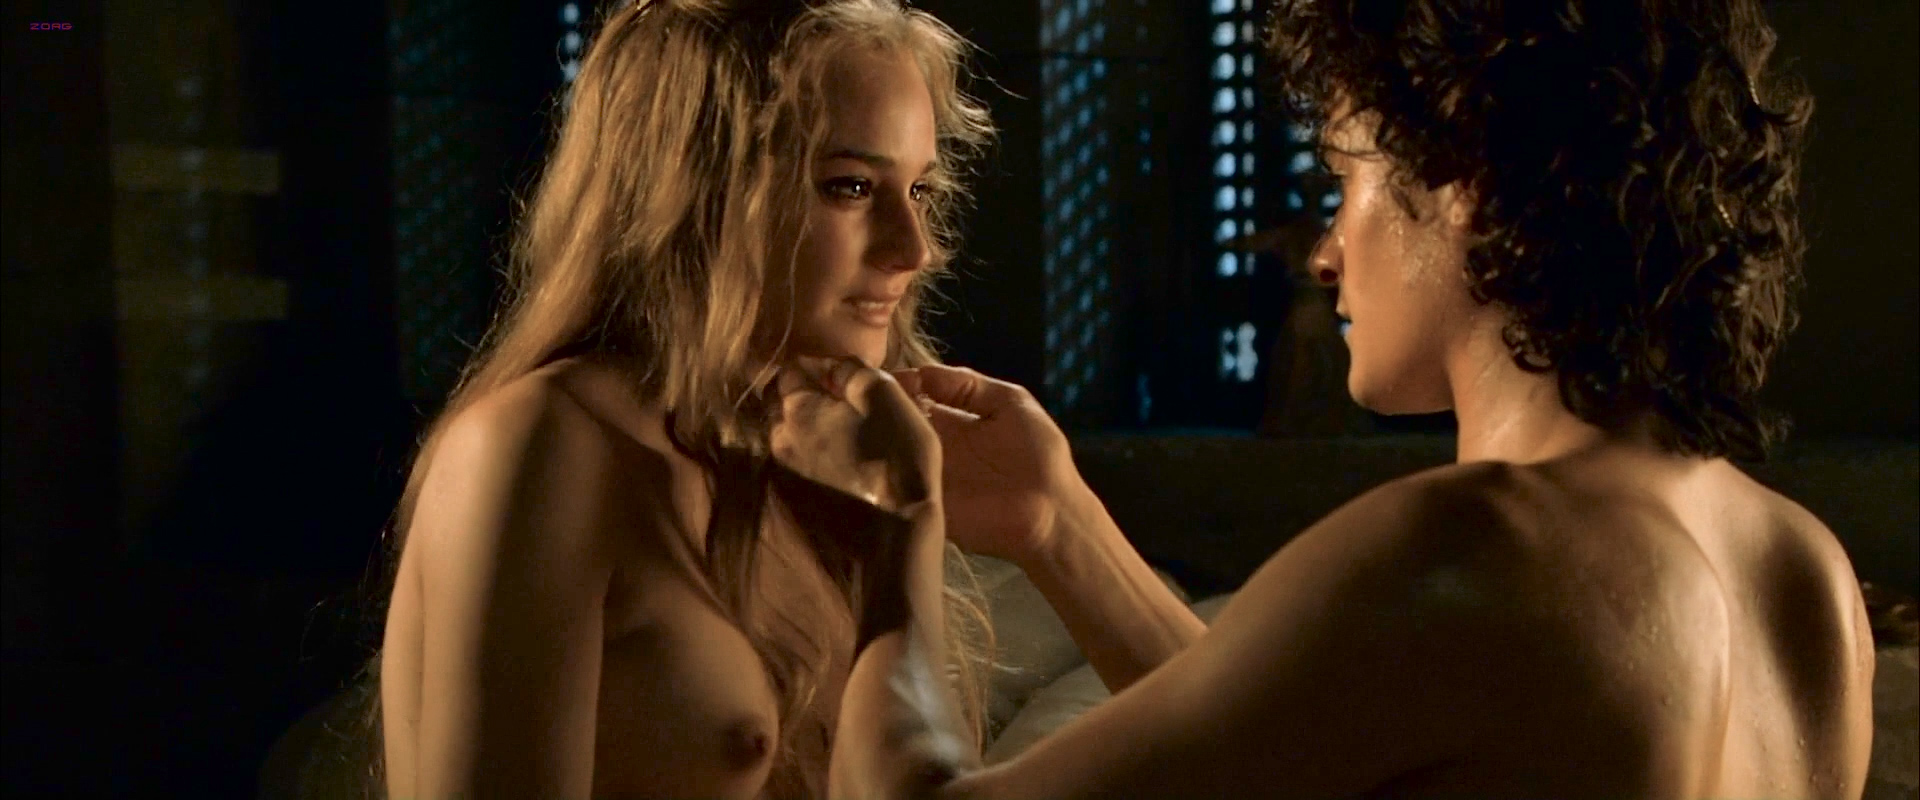 diane kruger topless pics